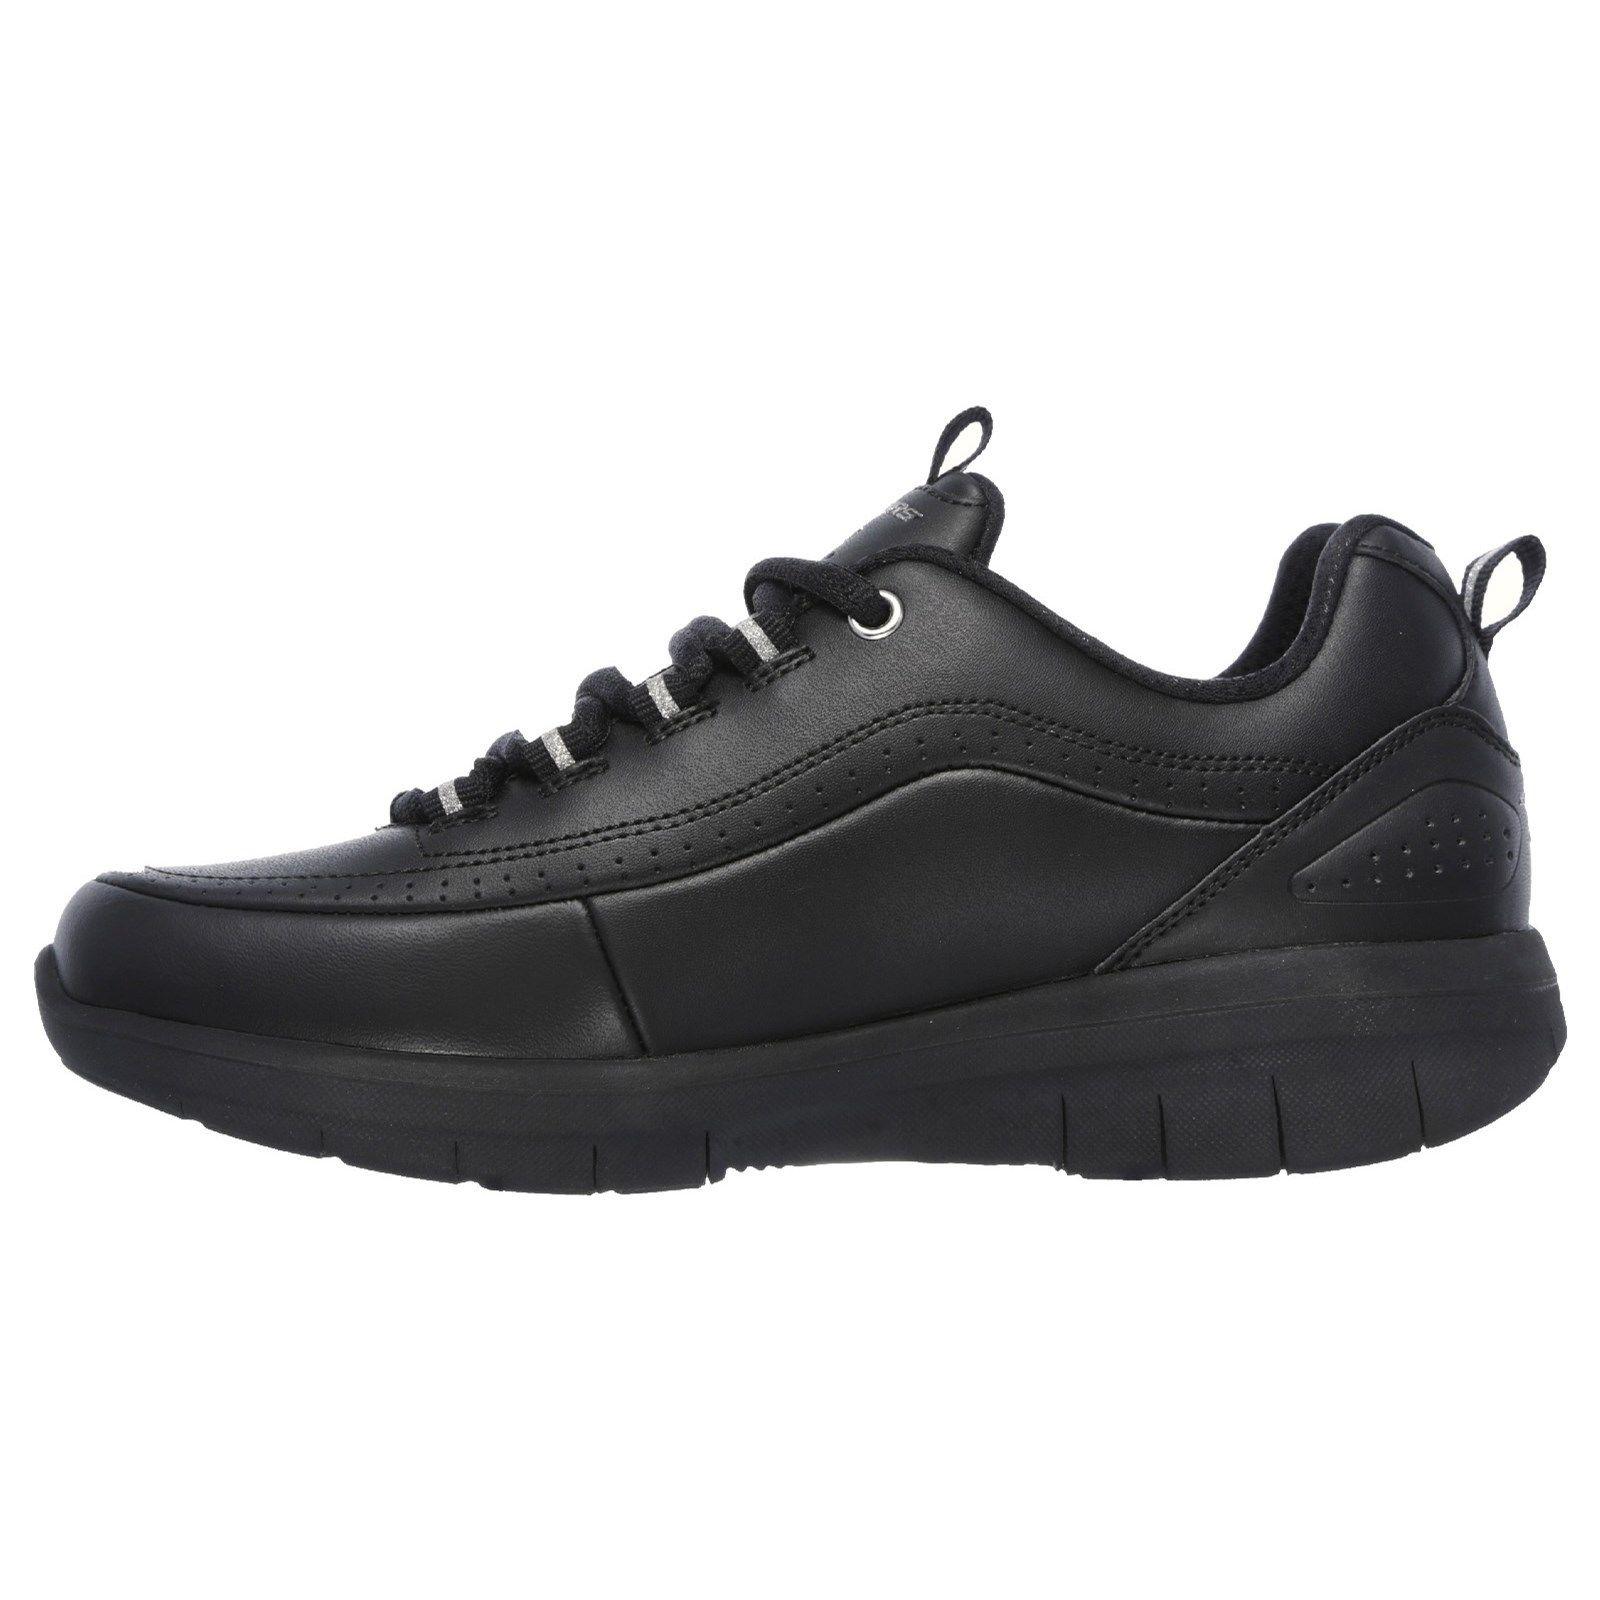 Skechers-Zapatillas-deportivas-Synergy-2-0-para-mujer-senora-FS4430 miniatura 8